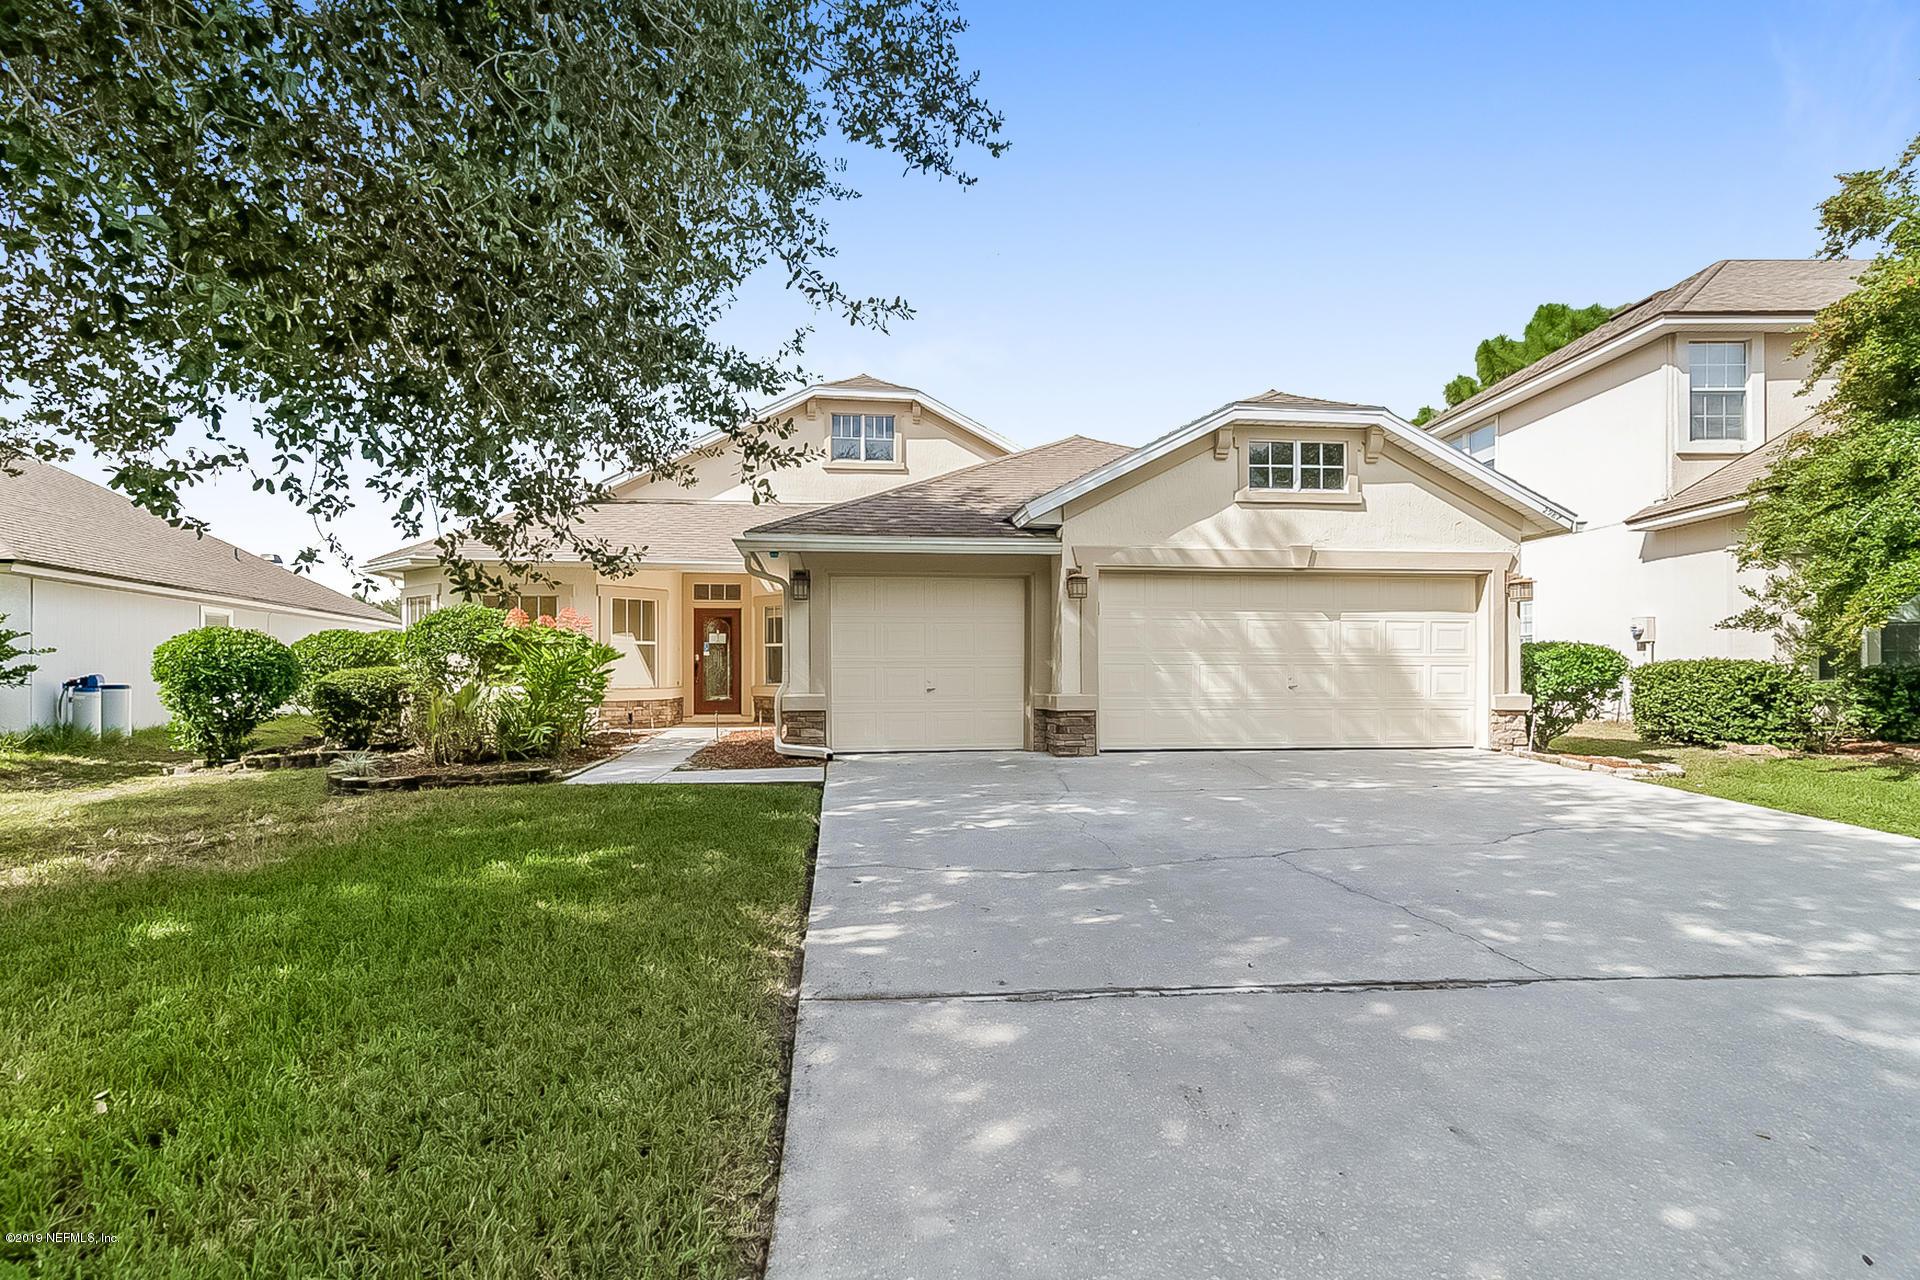 2987 THORNCREST- ORANGE PARK- FLORIDA 32065, 4 Bedrooms Bedrooms, ,2 BathroomsBathrooms,Residential - single family,For sale,THORNCREST,1022164